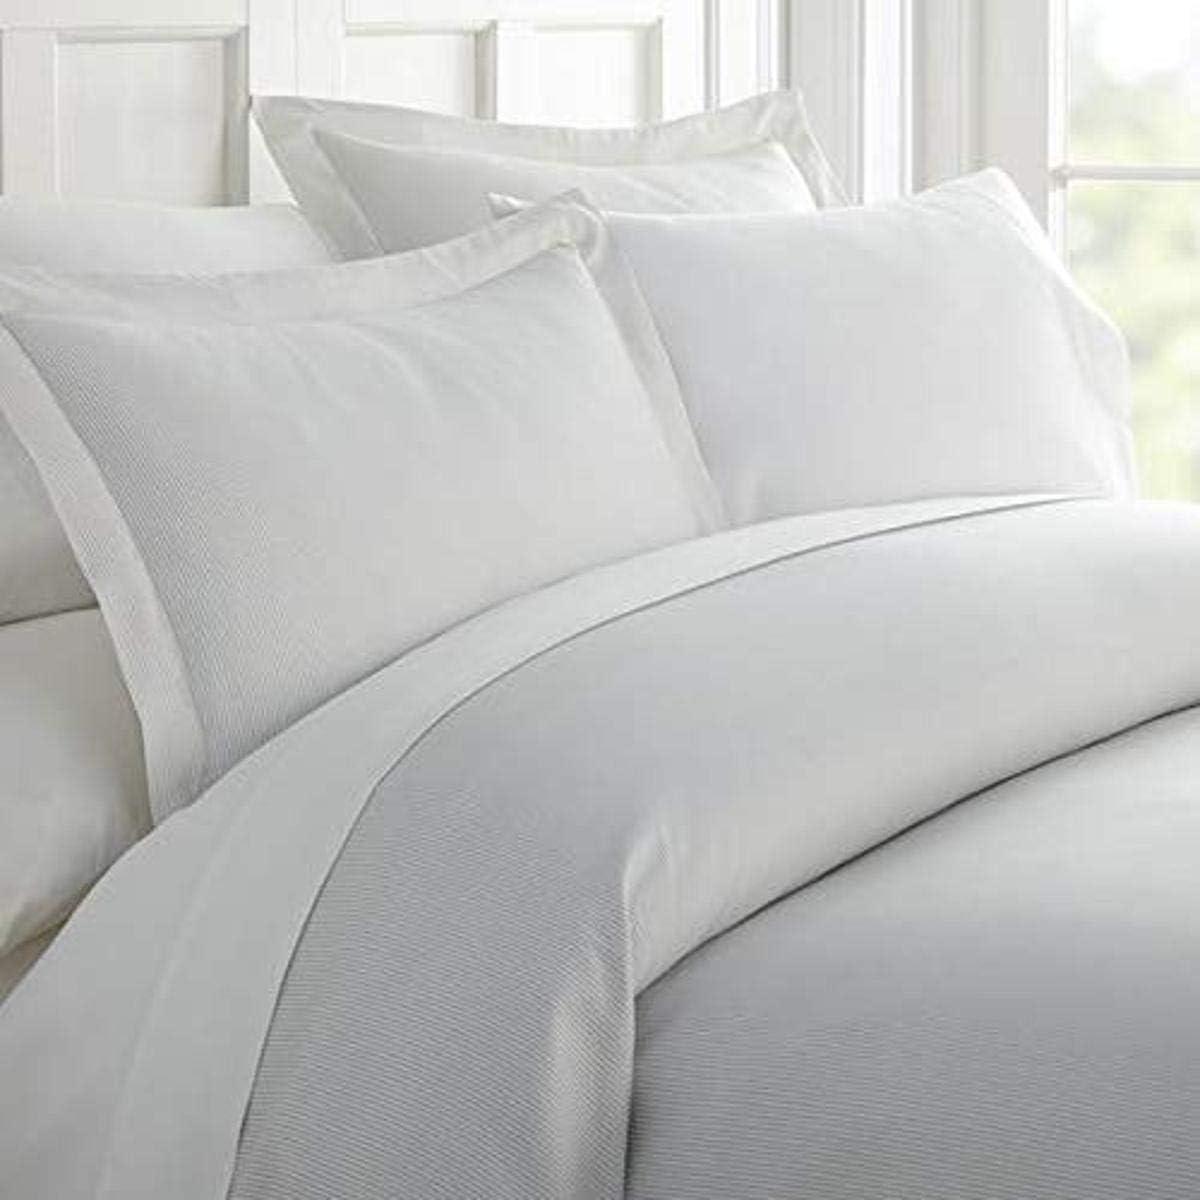 Linen Market Patterned 3 Piece Duvet Cover Set, Twin/Twin Extra Long, Pinstriped Light Gray